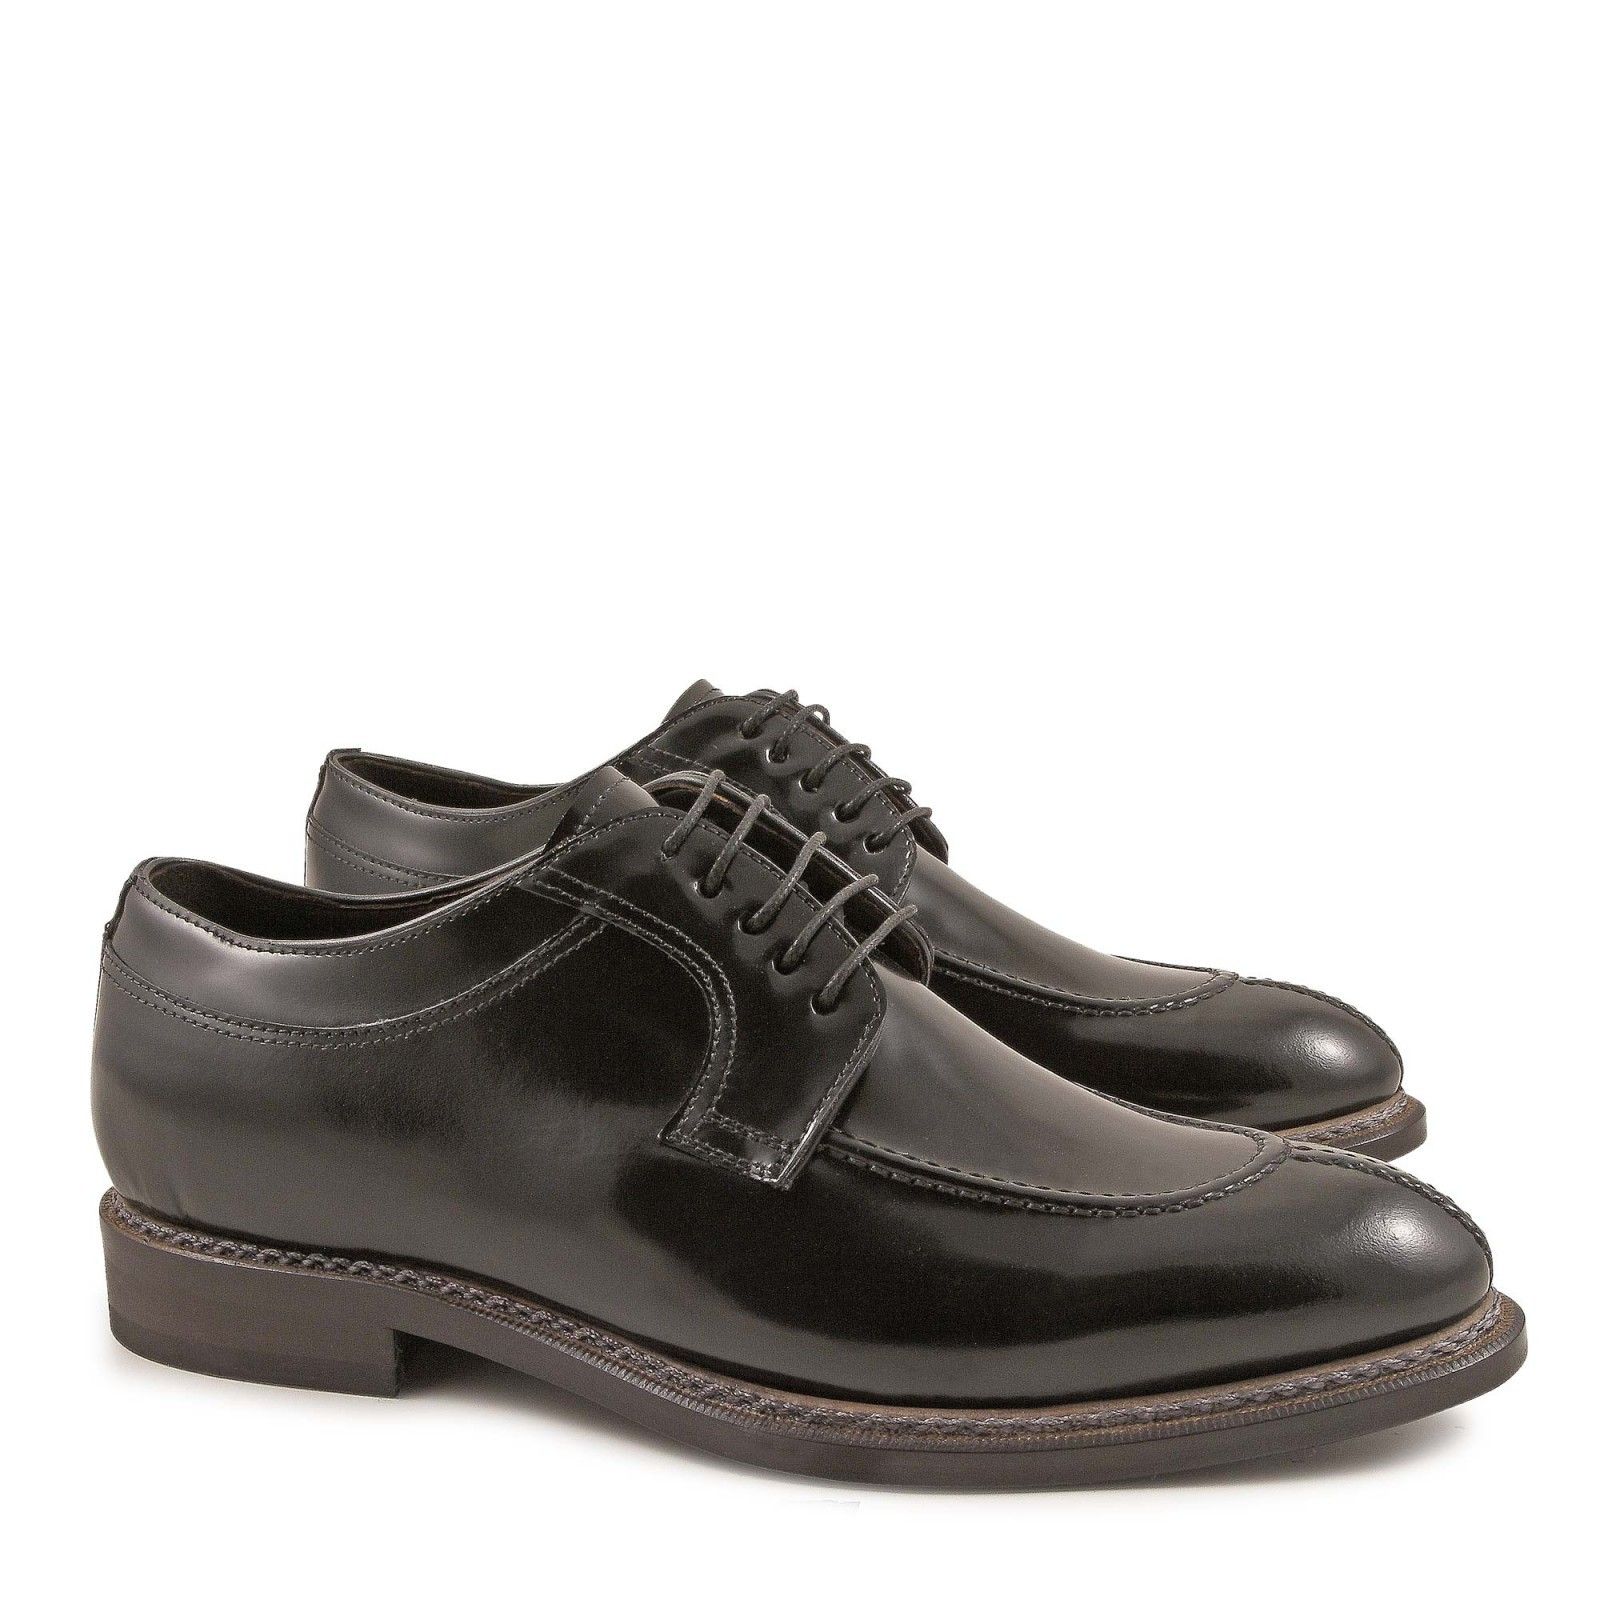 handmade s italian dress shoes in black leather